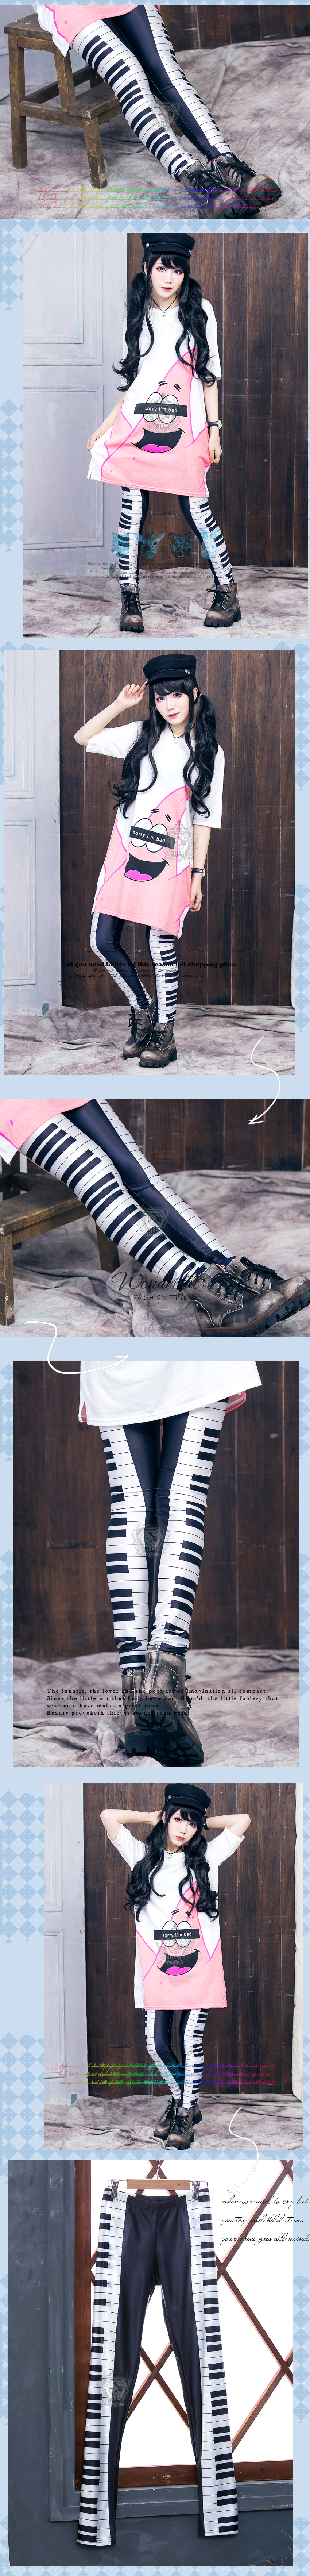 lolita princess diary Music march Piano keyboard 3D print leggings【J1M2039】